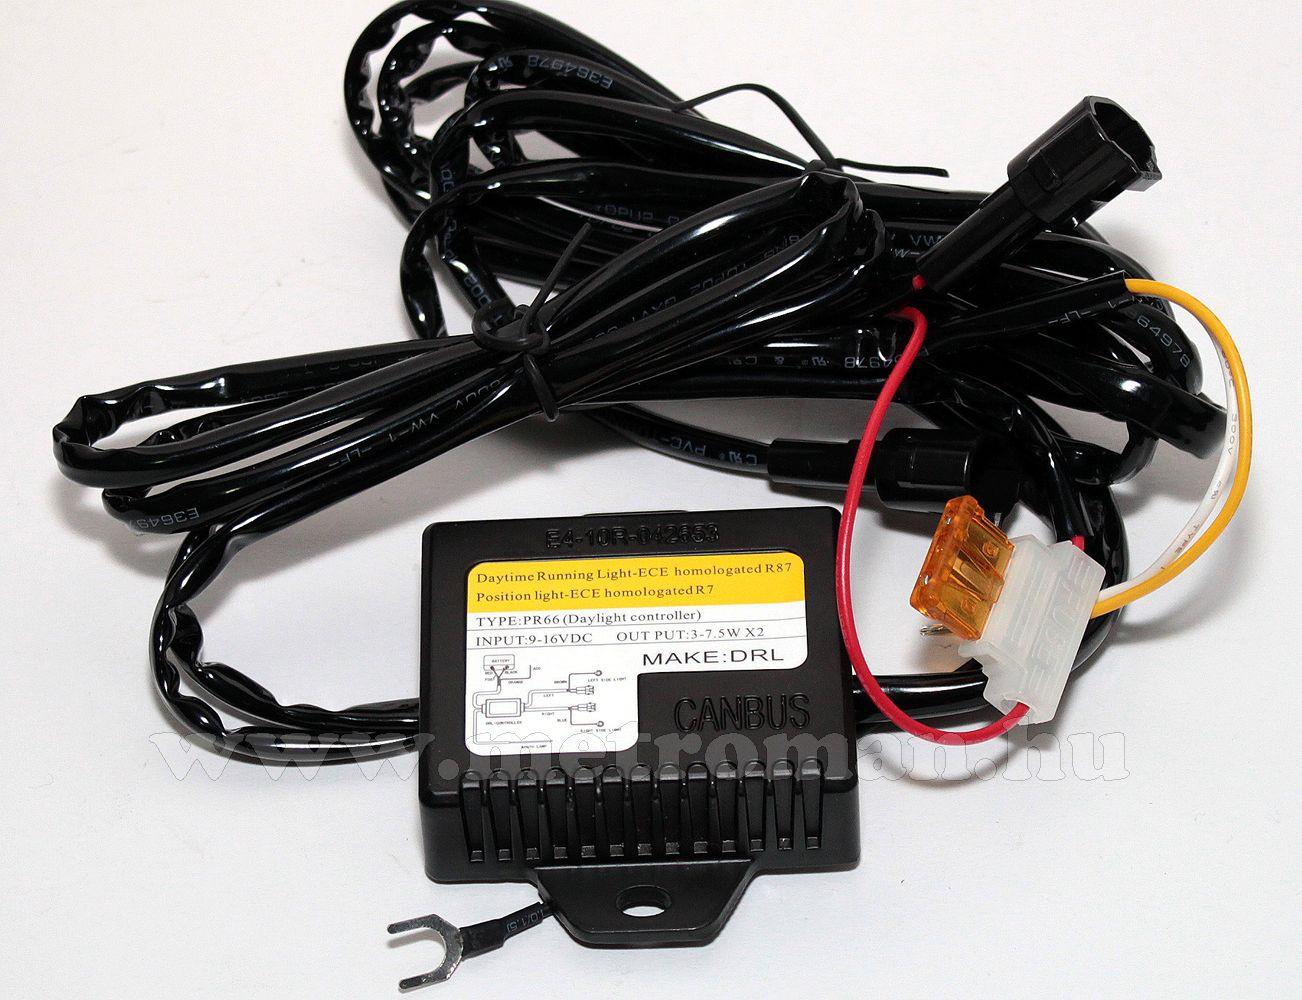 Nappali menetfény LED, DRL, E jeles, M-Tech 902HP